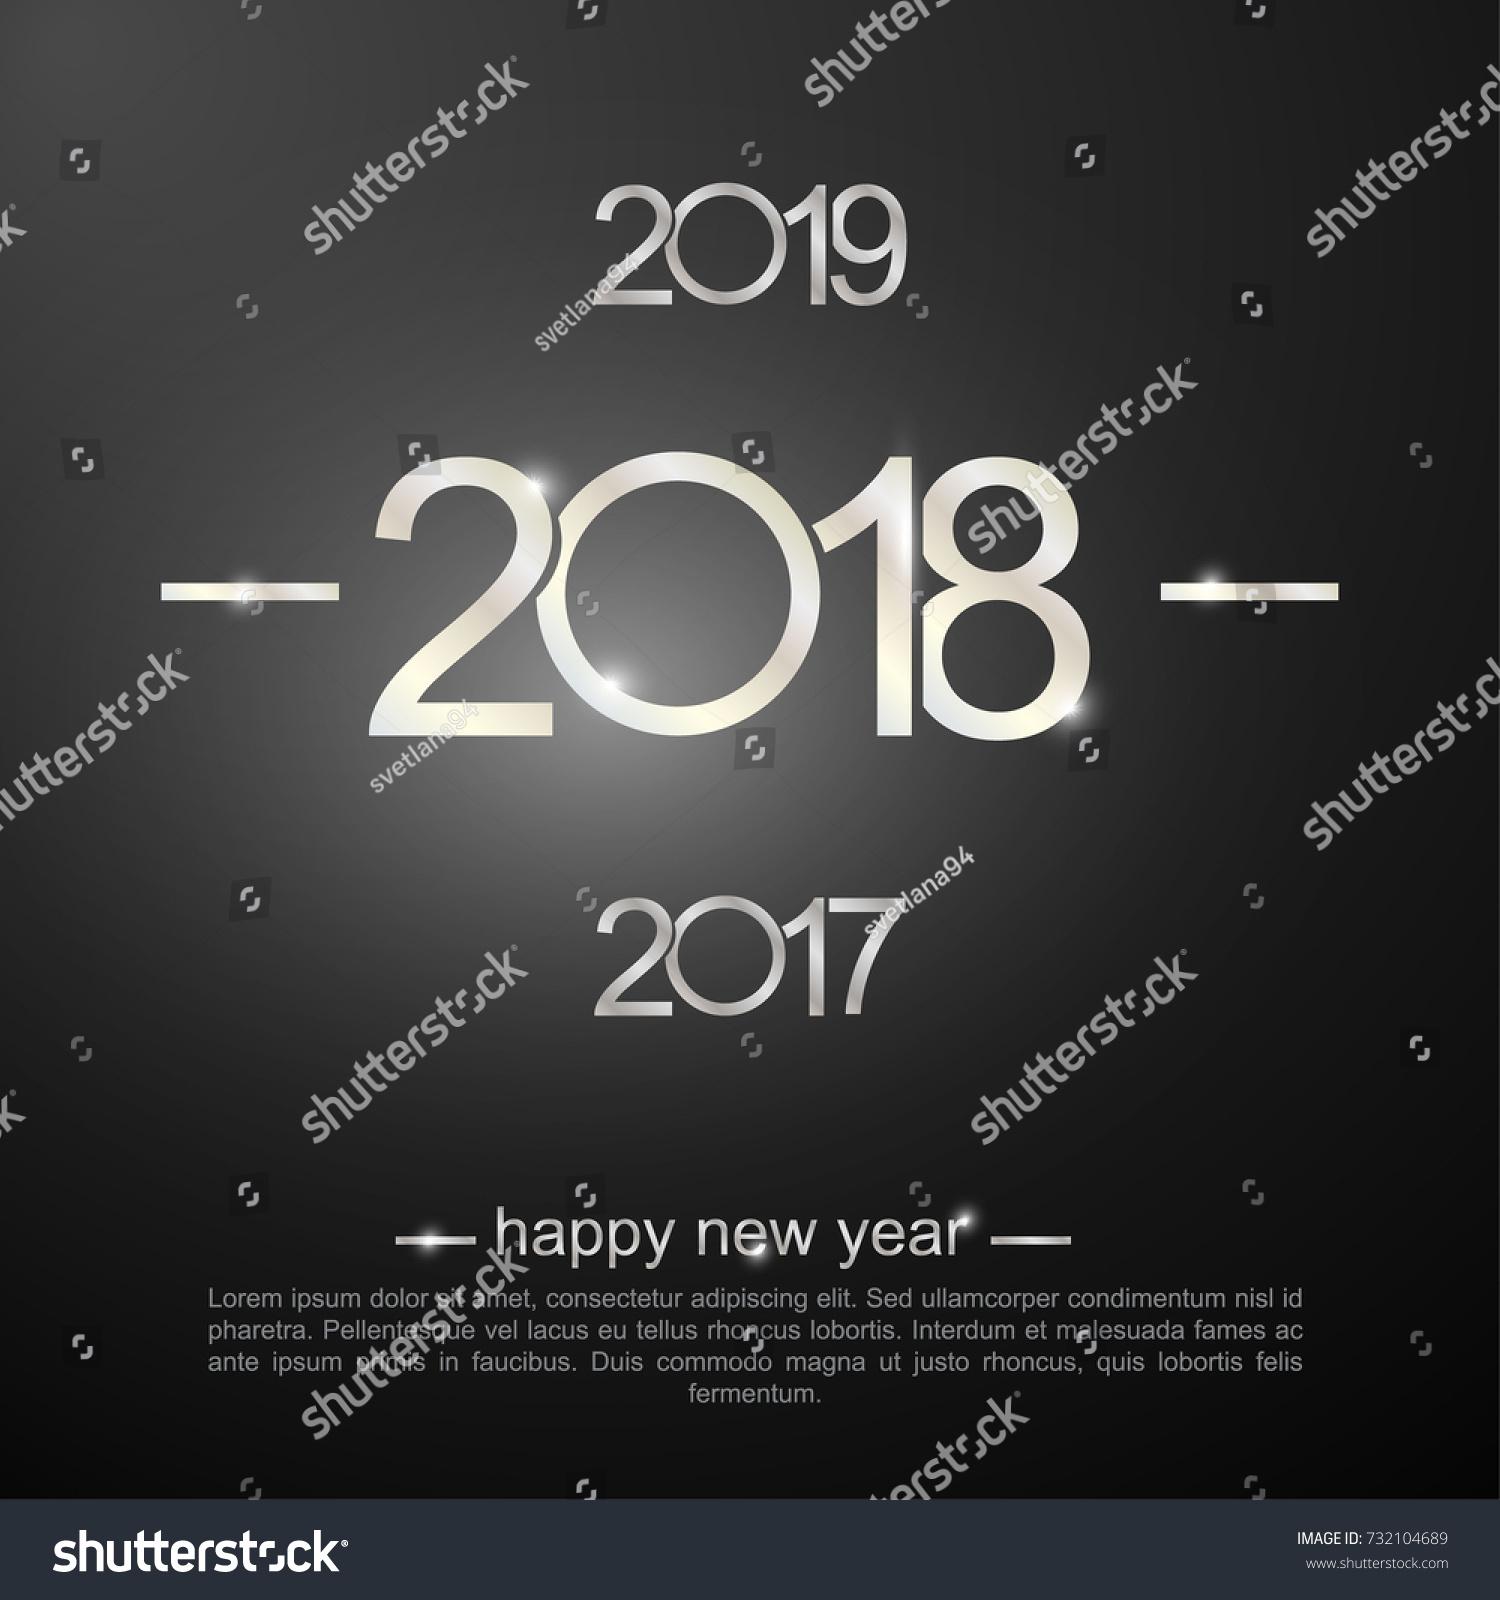 Happy New Year 2018 2017 2019 Stock Vector 732104689 - Shutterstock